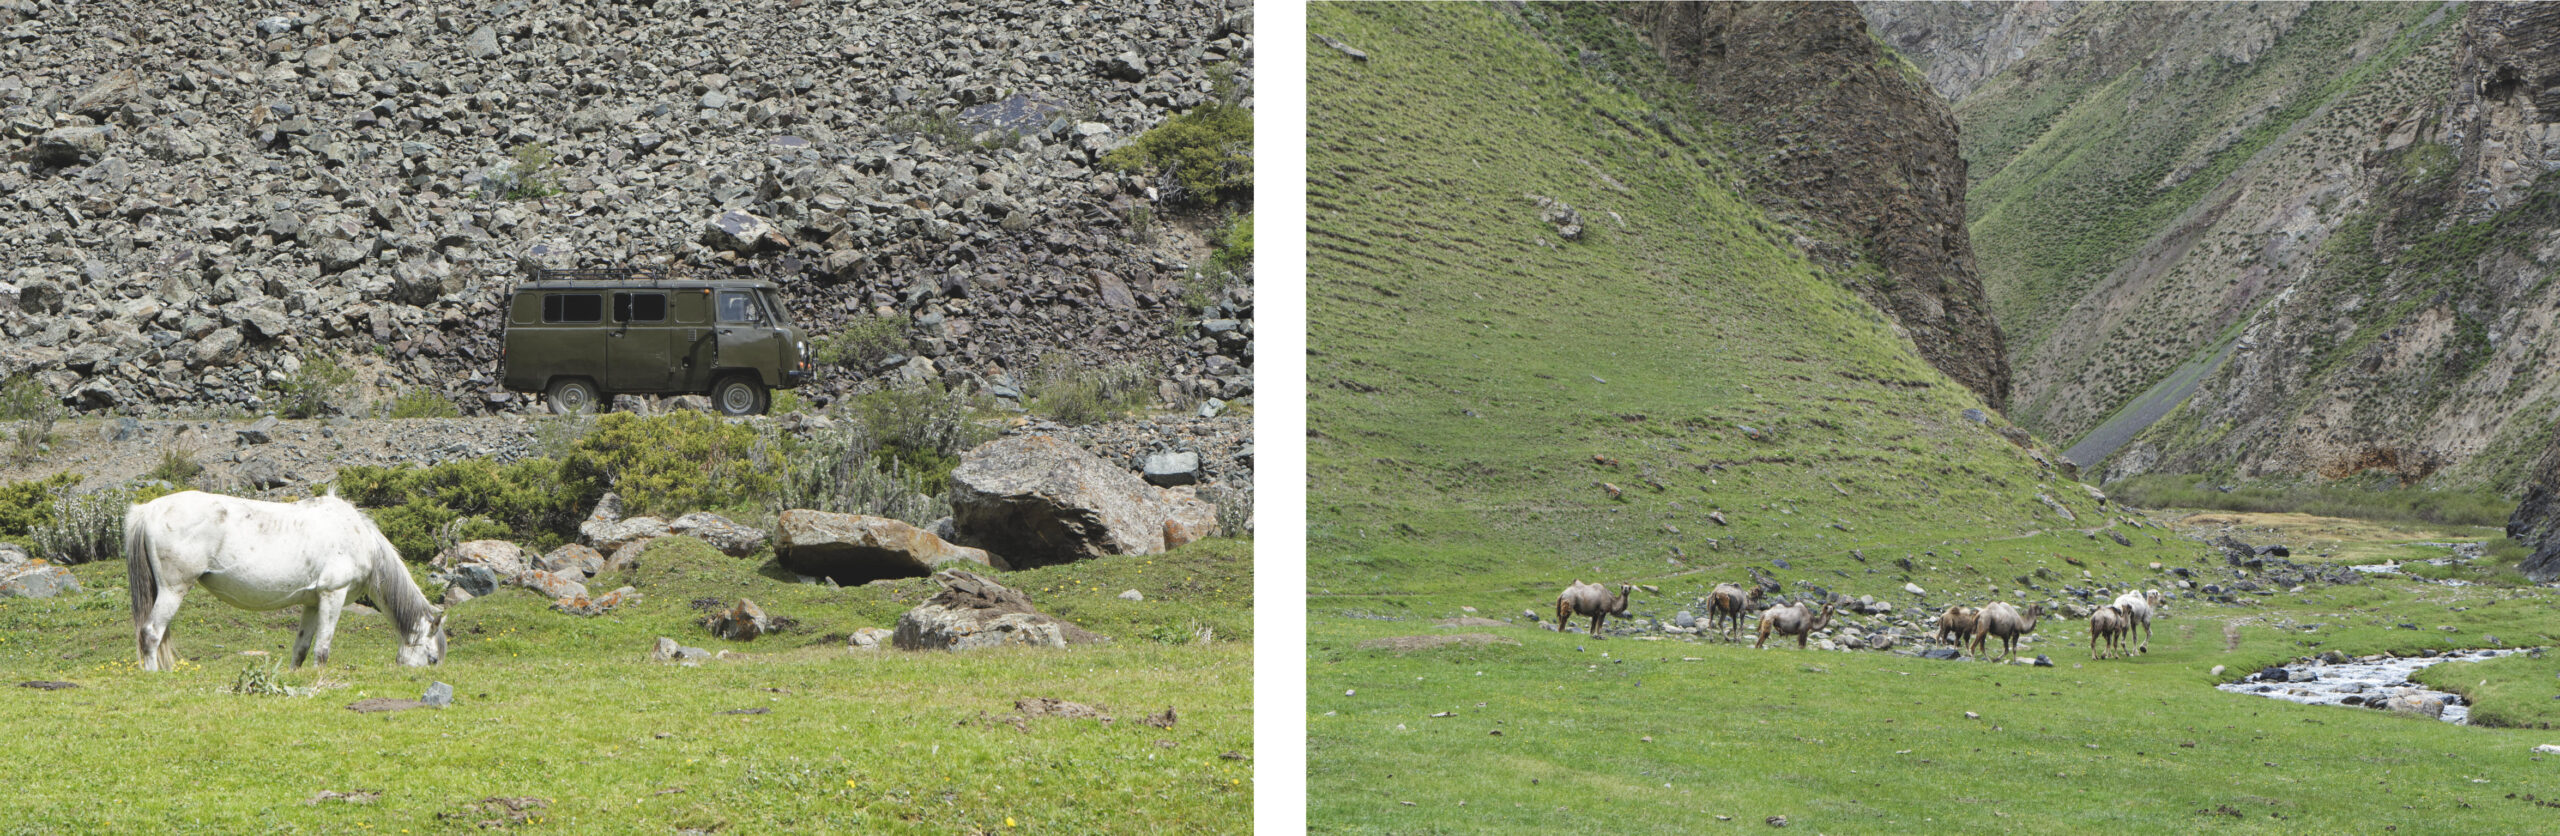 Bukhanka, cheval et chameaux Kirghizstan